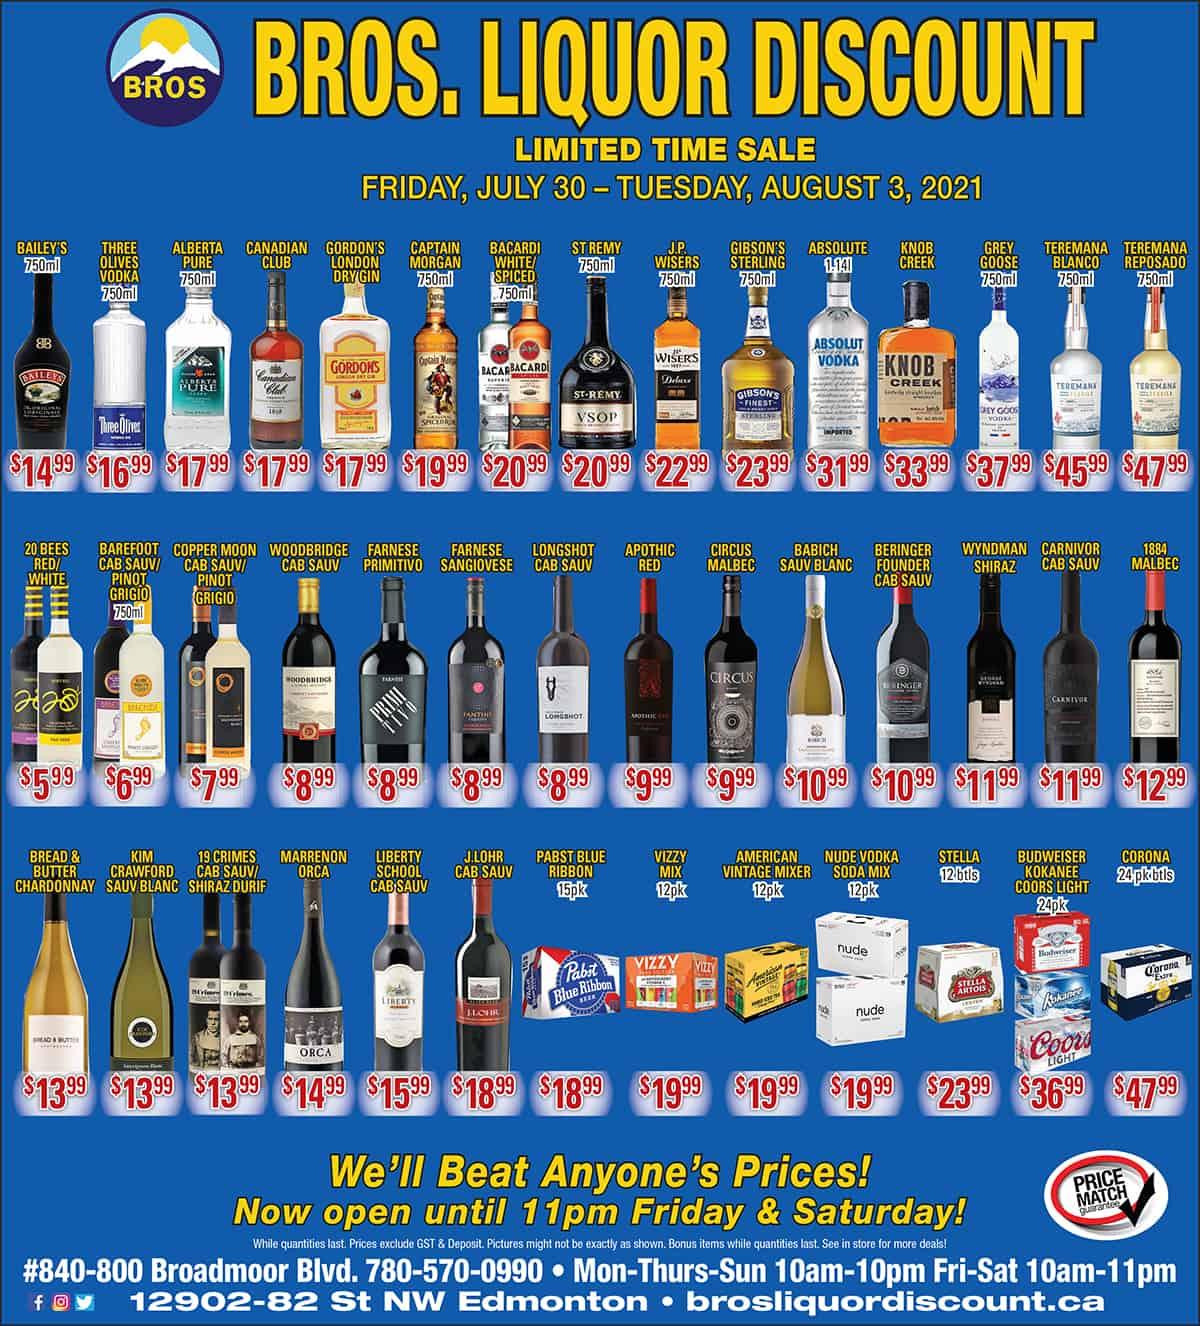 Discount Liquor Flyer july 2021, Sherwood Park, AB